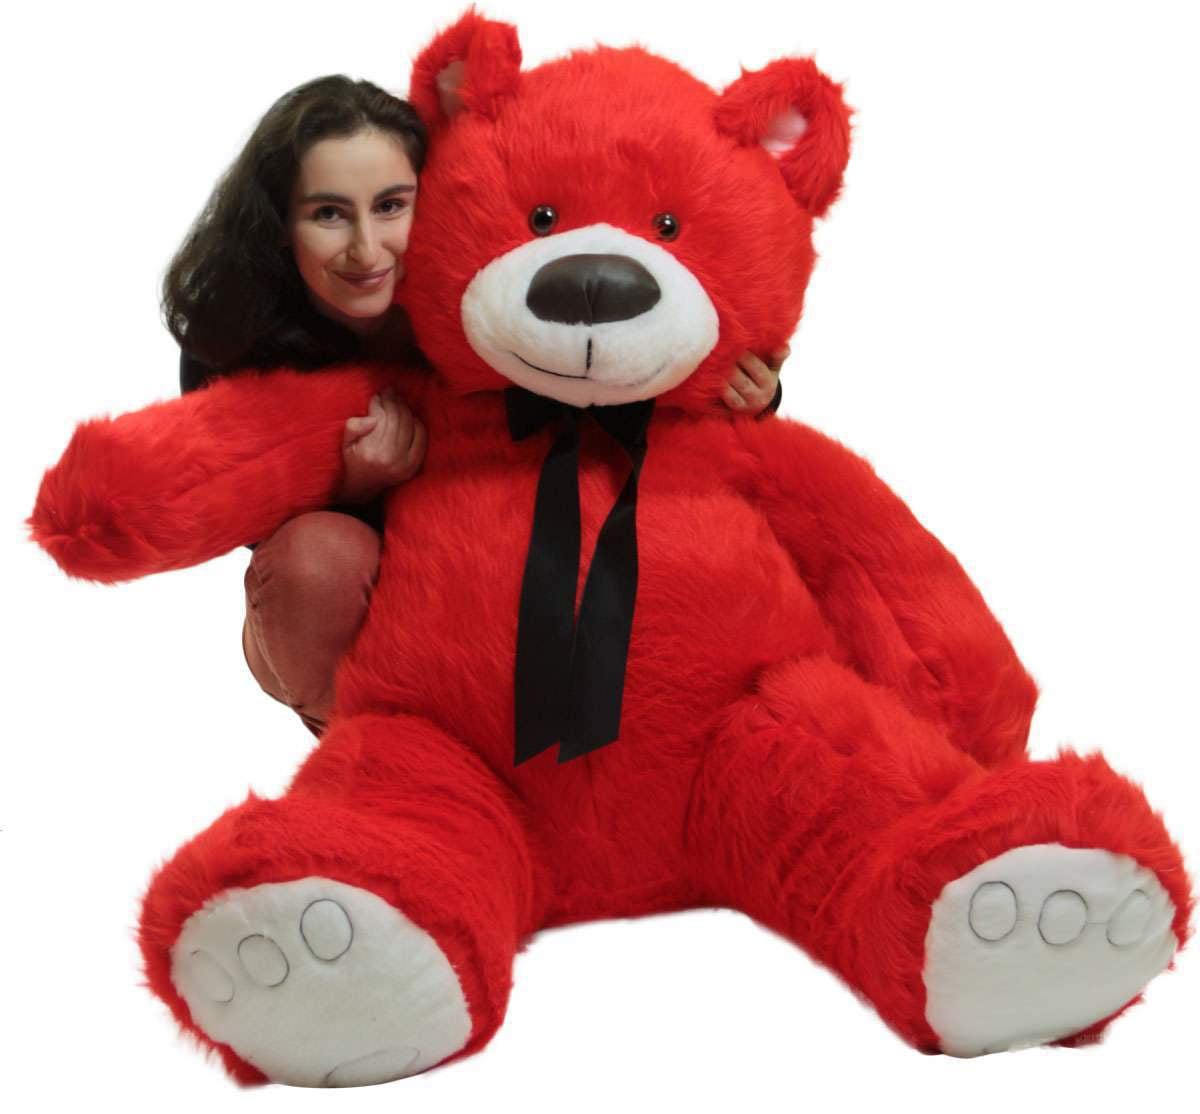 Giant Valentine Red Teddy Bear, Big Plush Soft Stuffed Animal Made in America by Big Plush